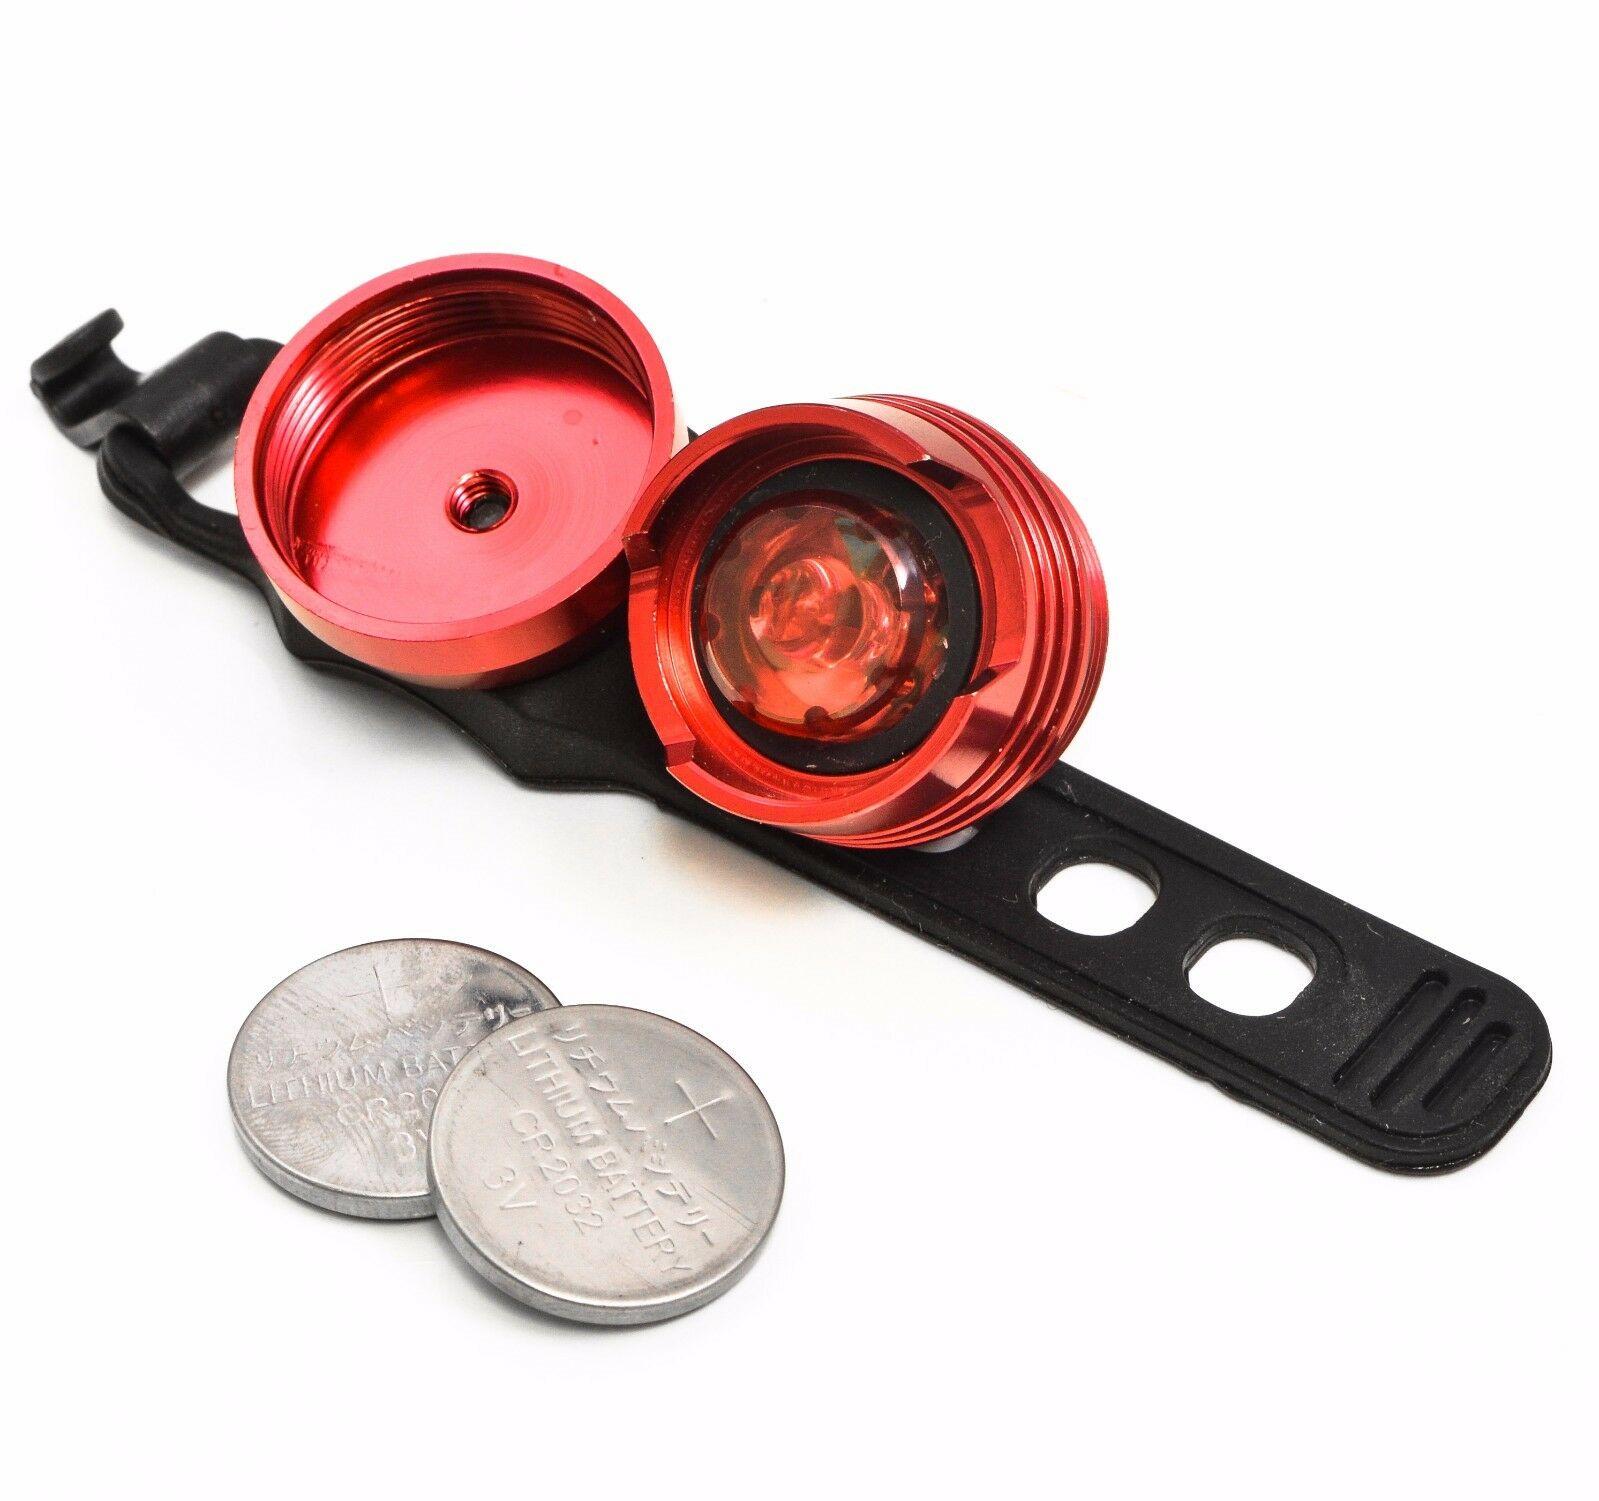 Lumintrail Waterproof LED Safety Bike Light Set White Headlight Red Taillight